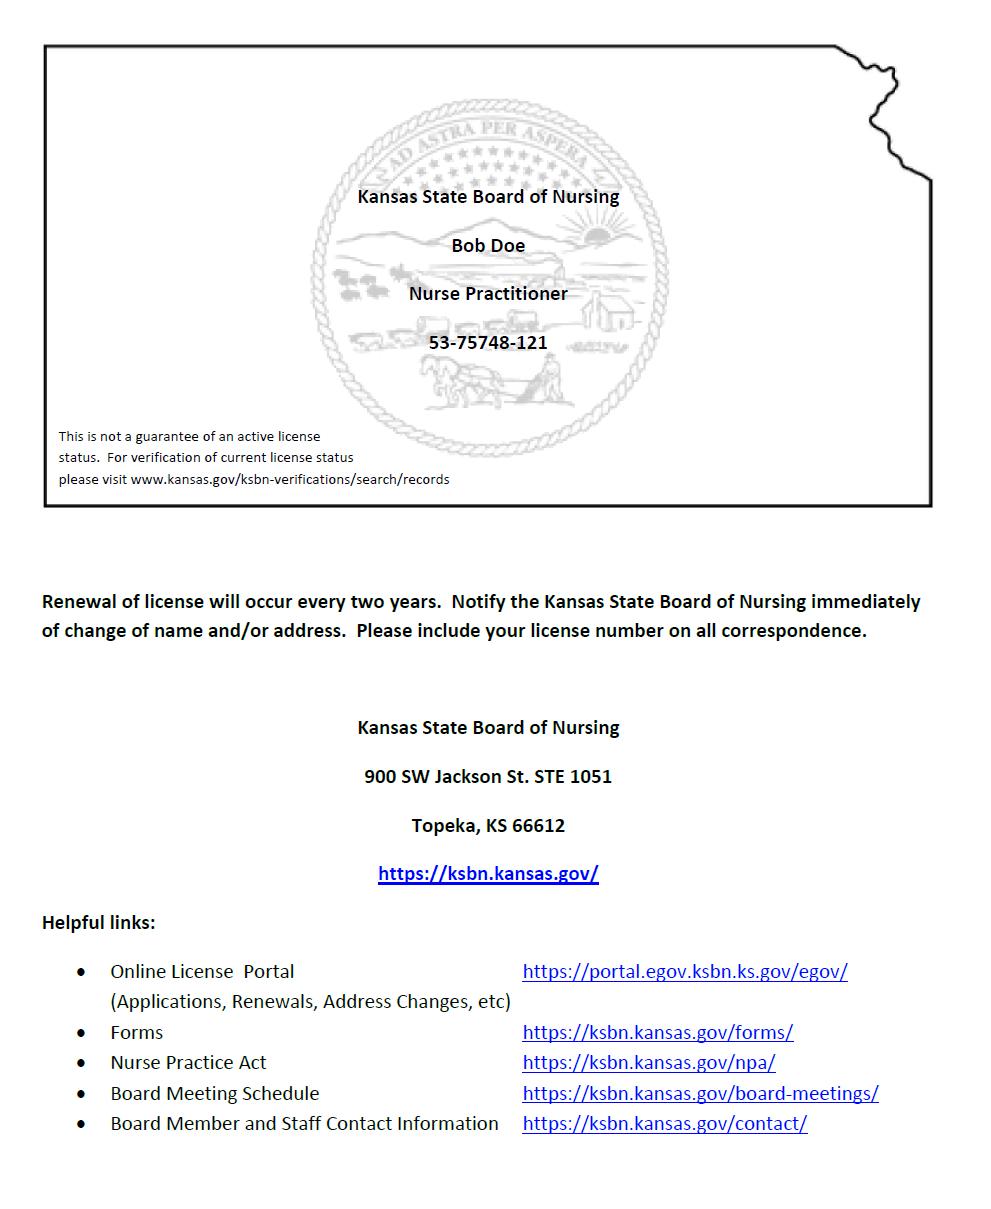 Print Licenses Ksbn Kansas Gov